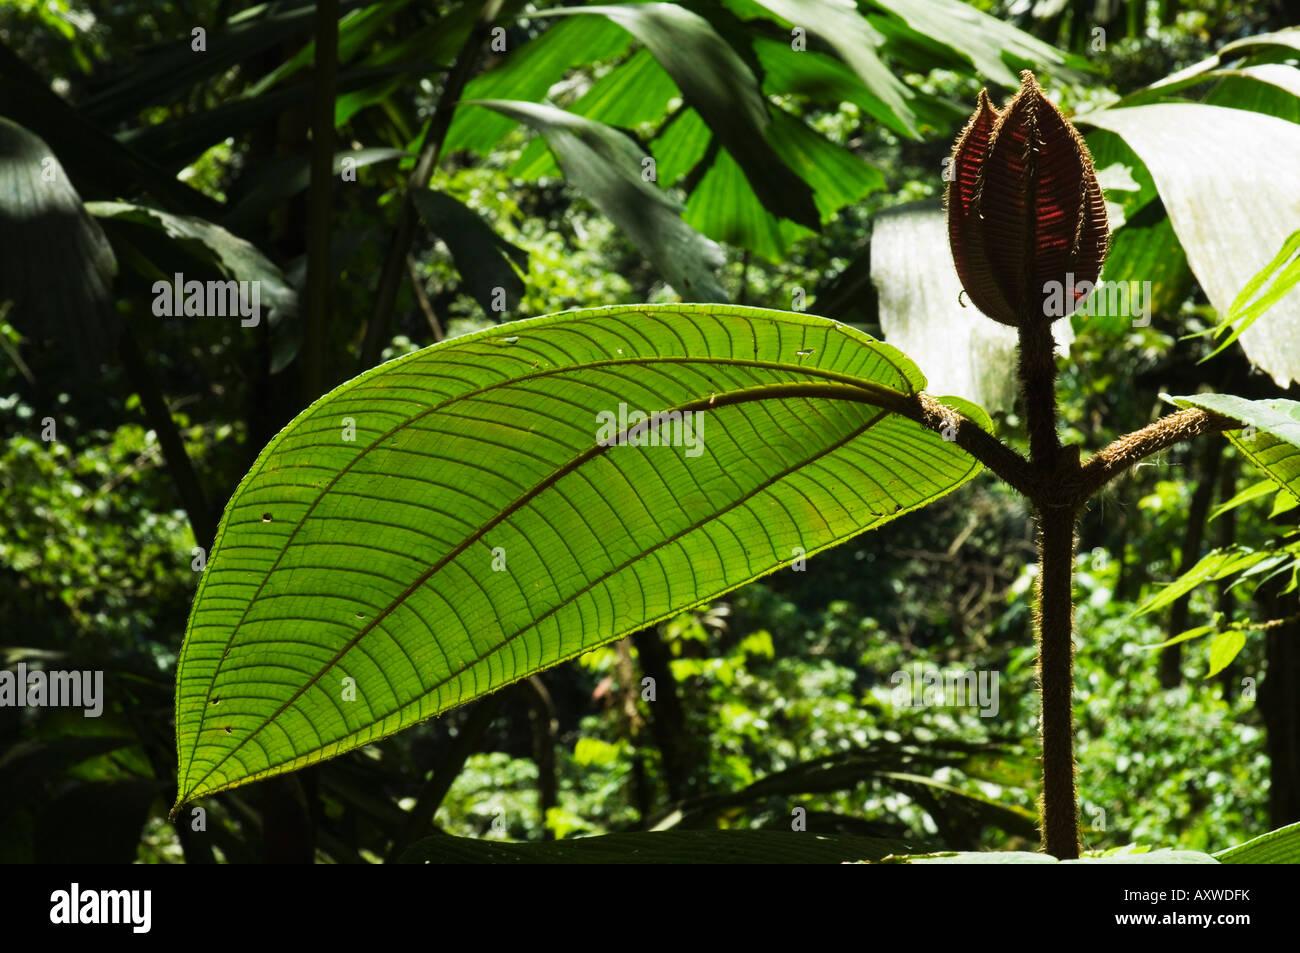 Rainforest vegitation, Hanging Bridges walk, Arenal, Costa Rica - Stock Image